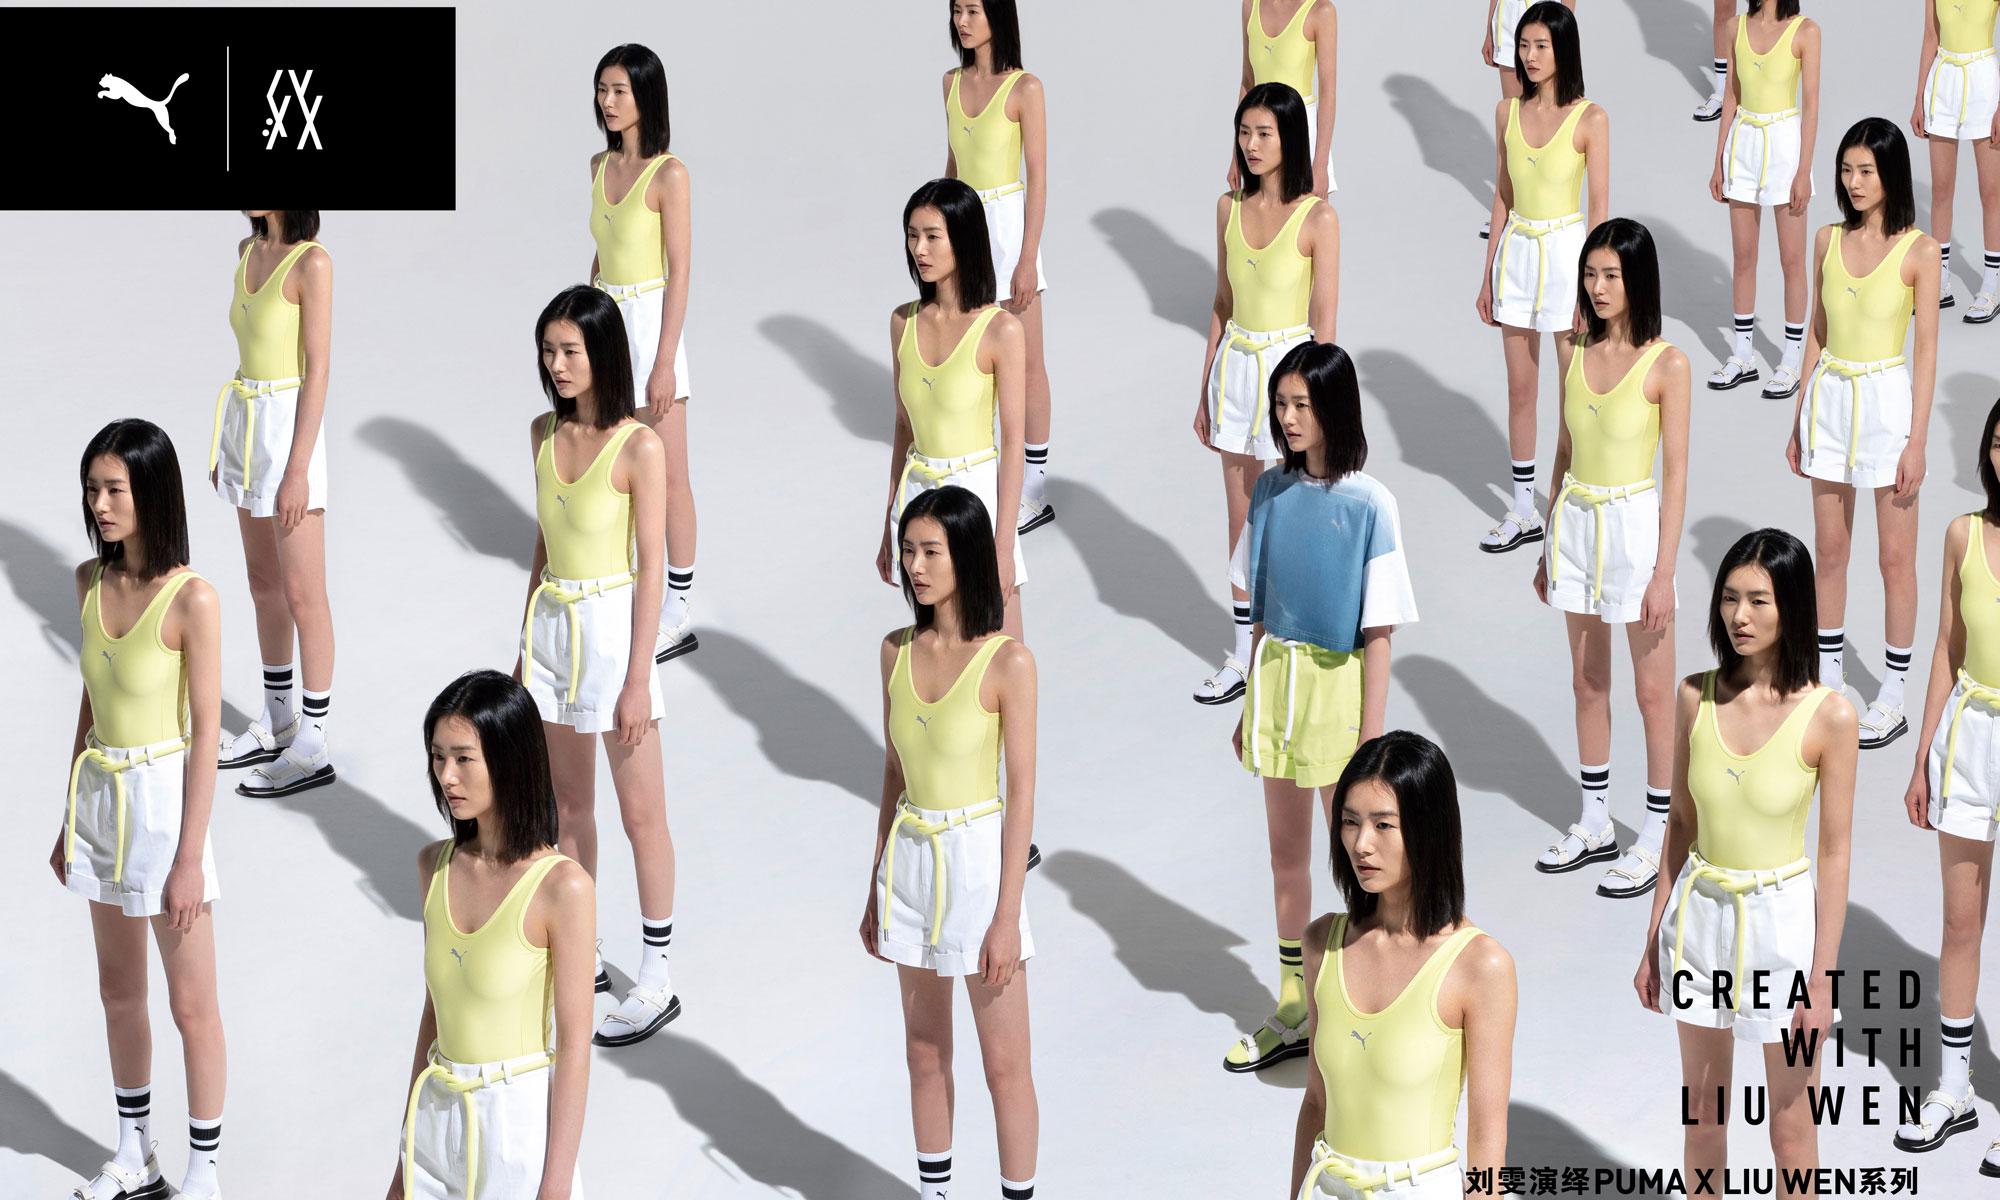 PUMA x LIU WEN 联名系列首度释出